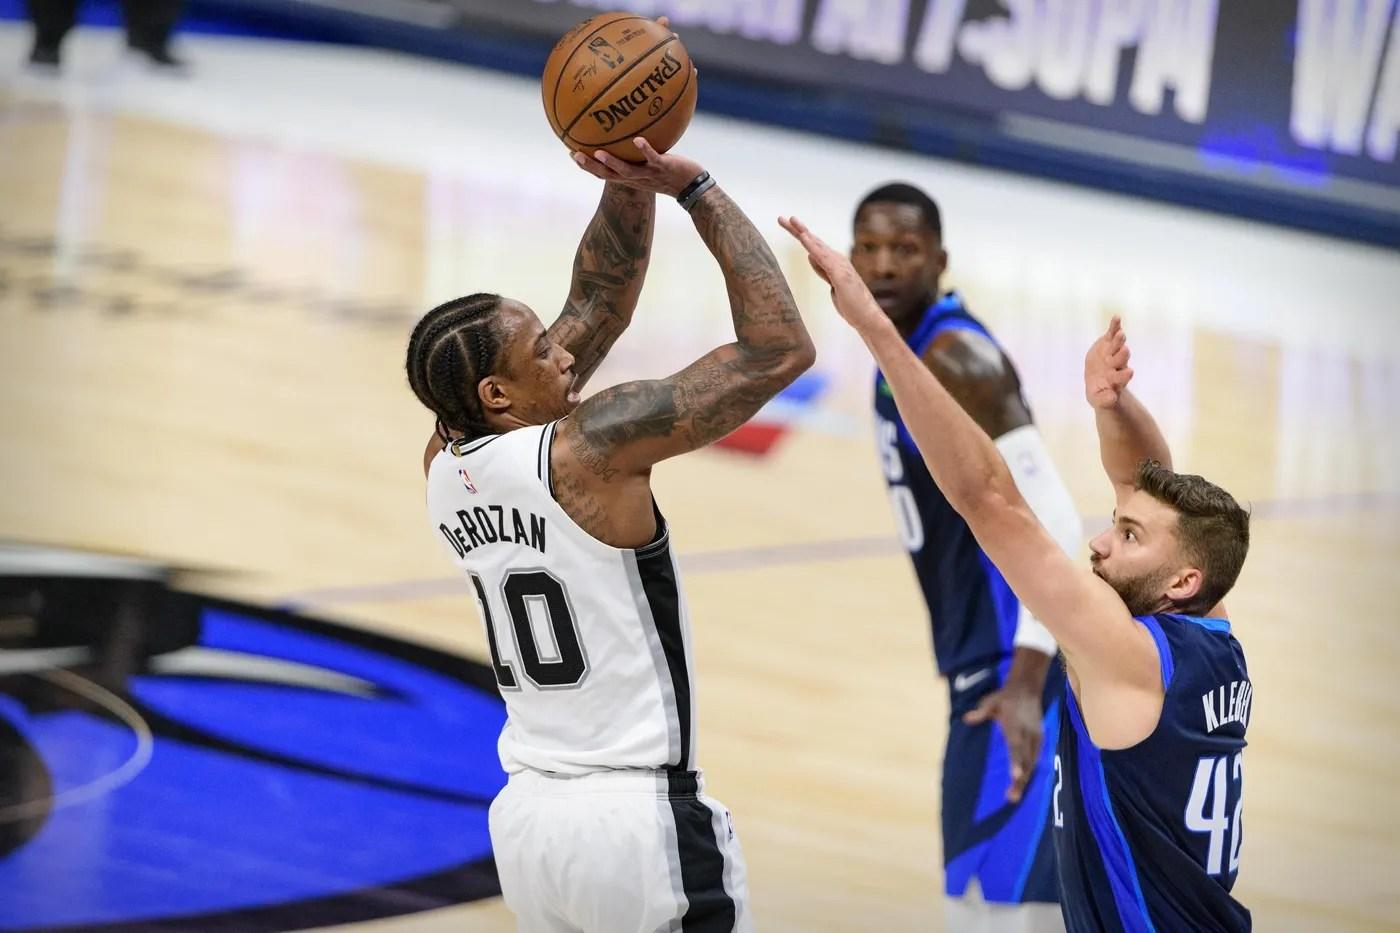 Mar 10, 2021; Dallas, Texas, USA; San Antonio Spurs forward DeMar DeRozan (10) shoots over Dallas Mavericks forward Maxi Kleber (42) during the second quarter at the American Airlines Center.